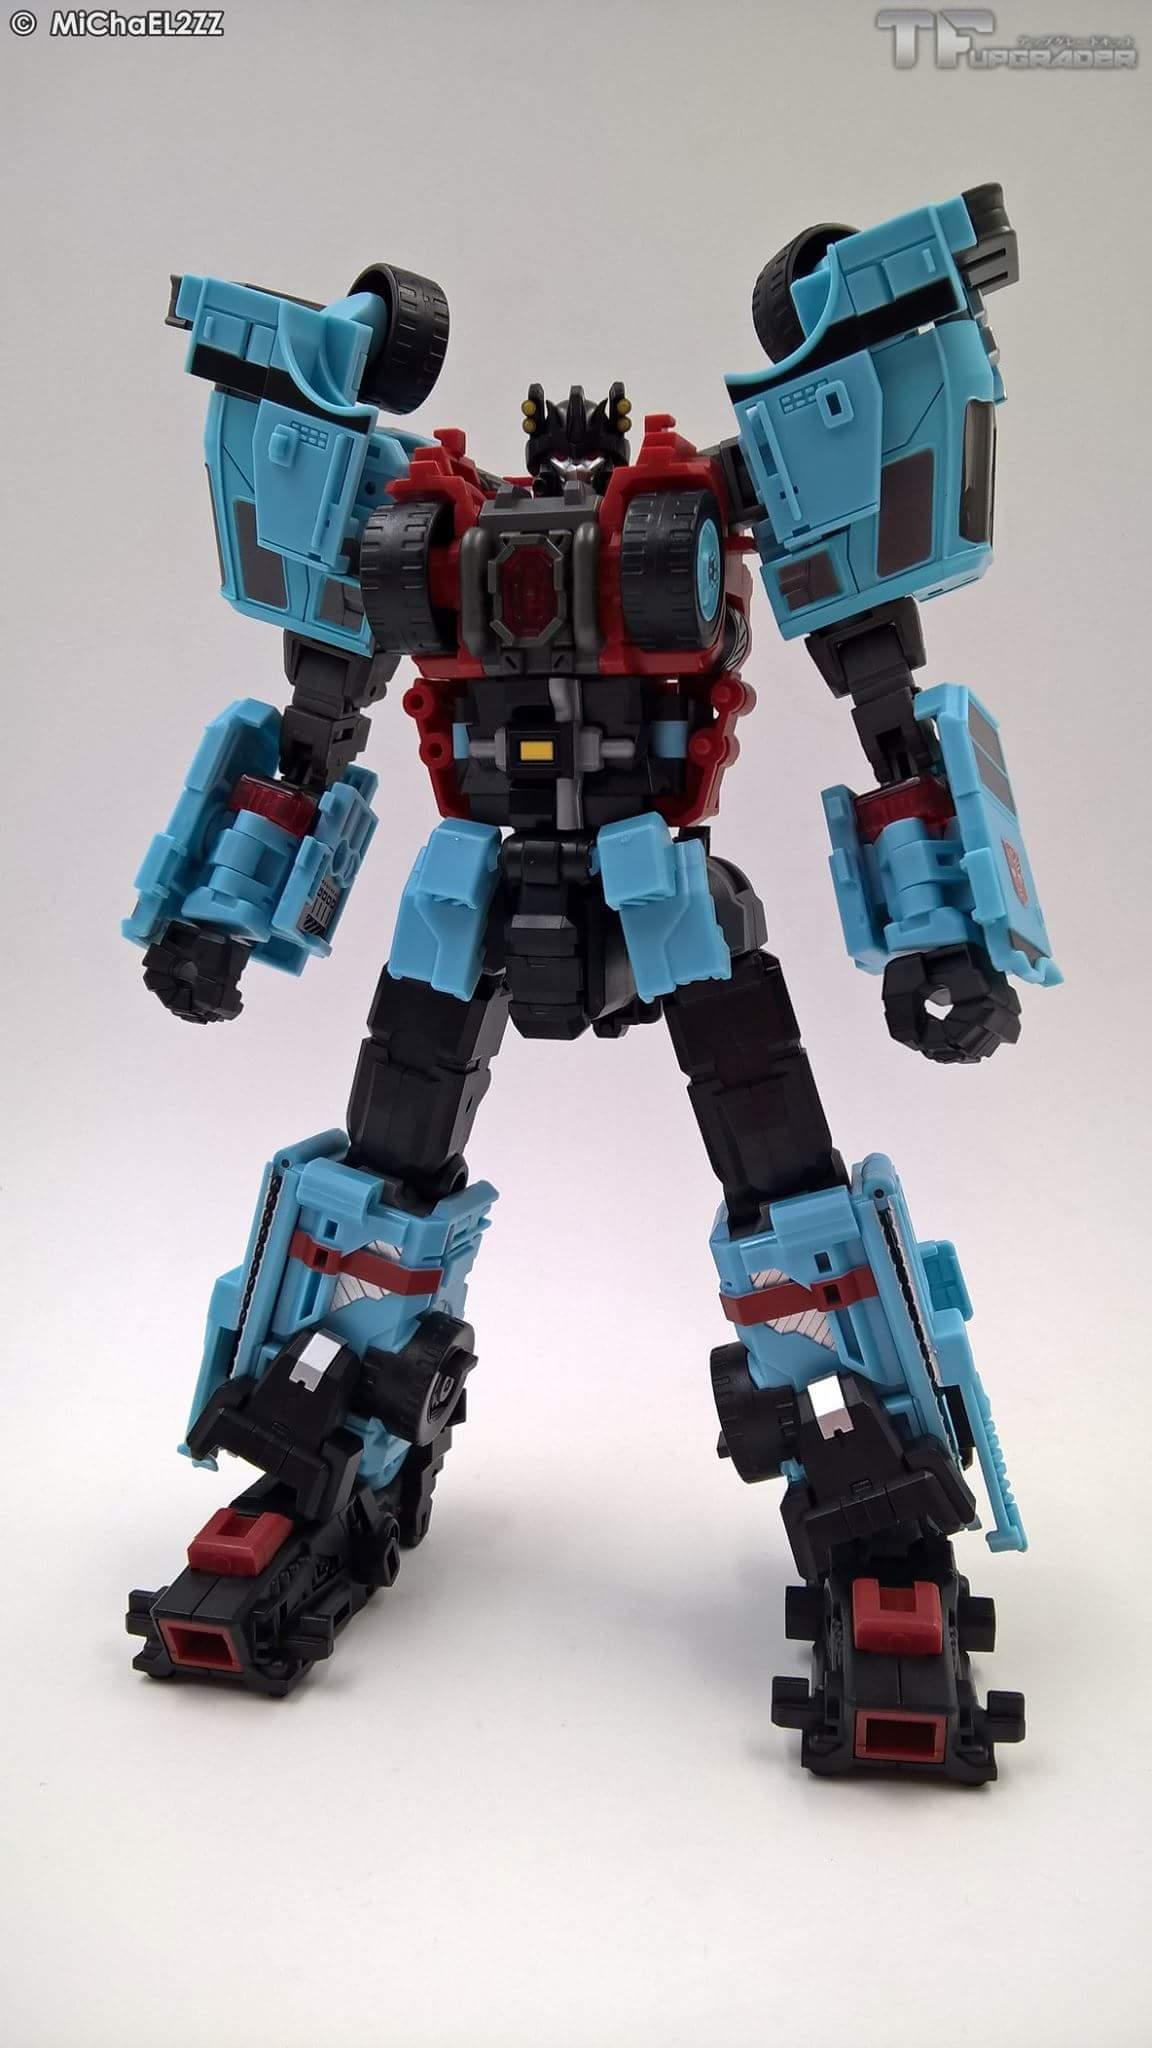 [MakeToys] Produit Tiers - Jouet MTCM-04 Guardia (aka Protectobots - Defensor/Defenso) - Page 4 9urAFOQs